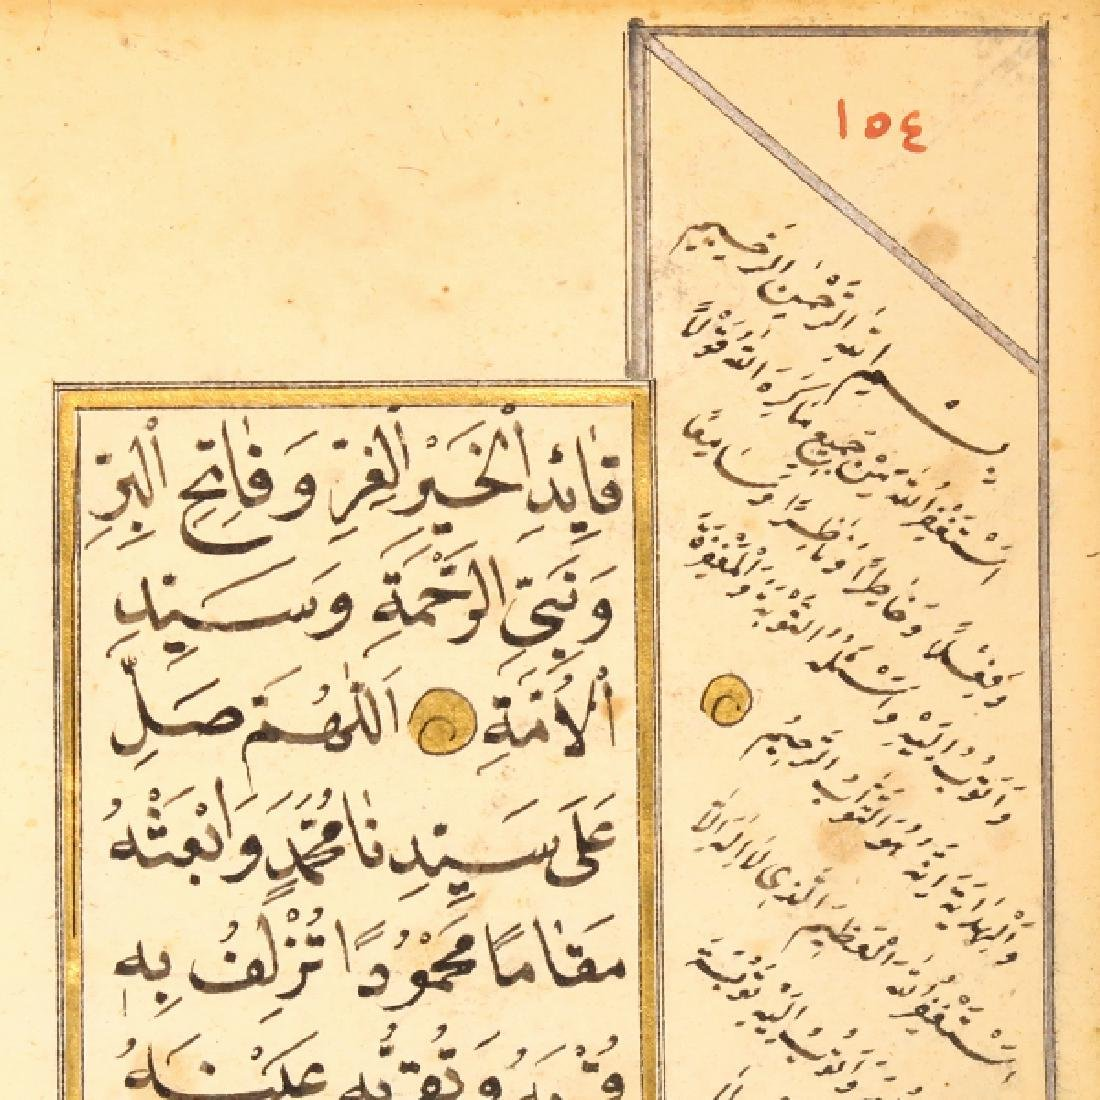 Arabic Illuminated/Gilt Manuscript, Near East, c. 16th - 3